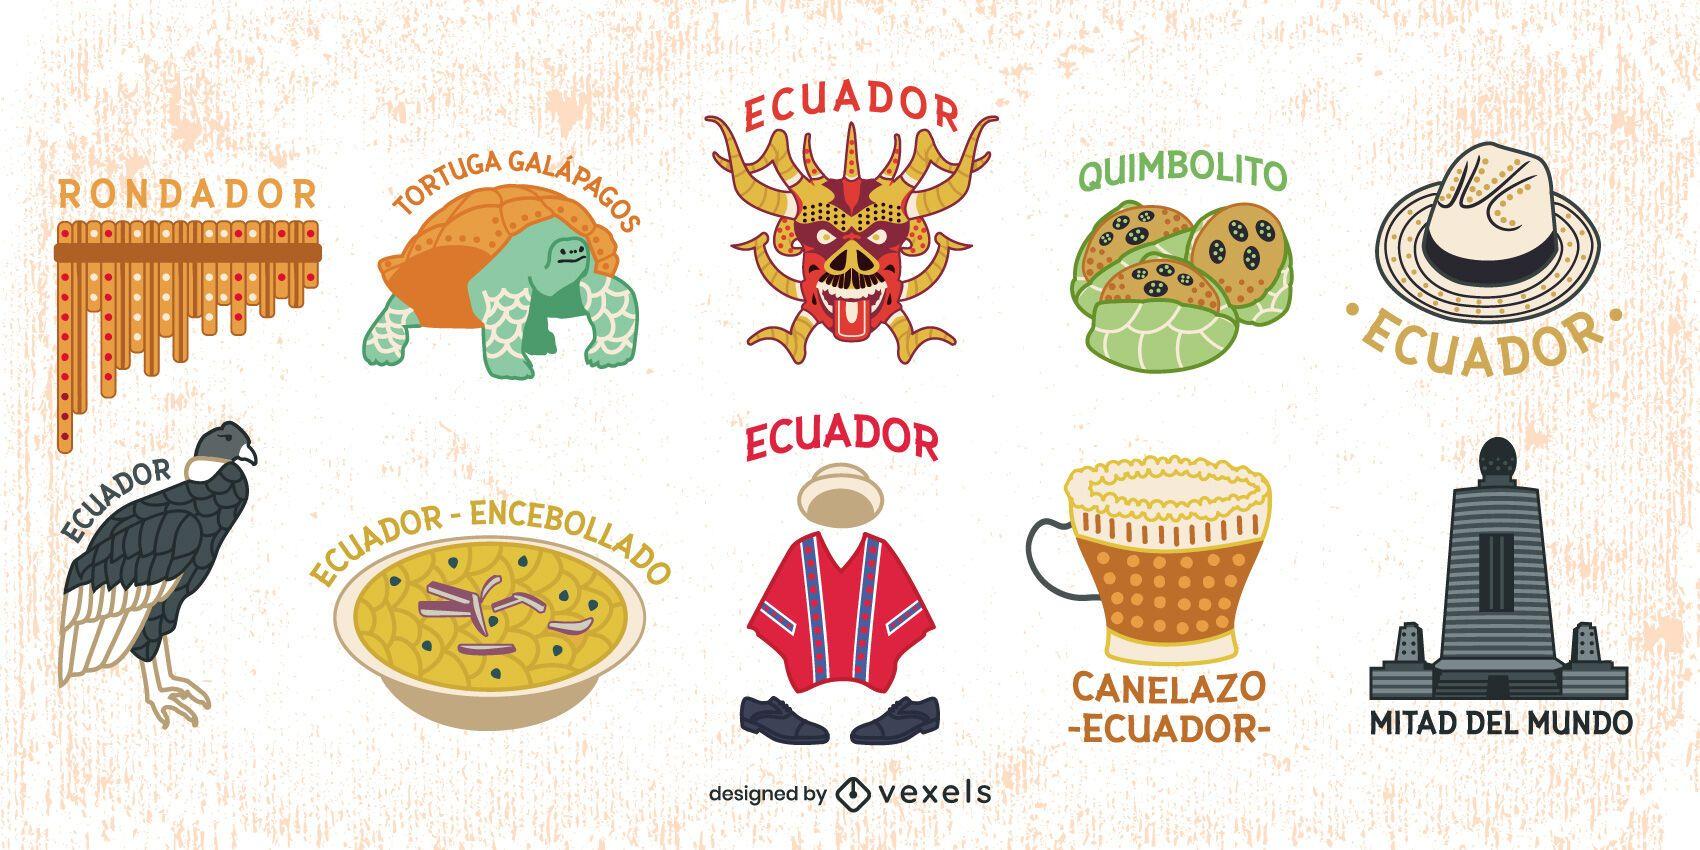 Ecuador Colorful Elements Pack